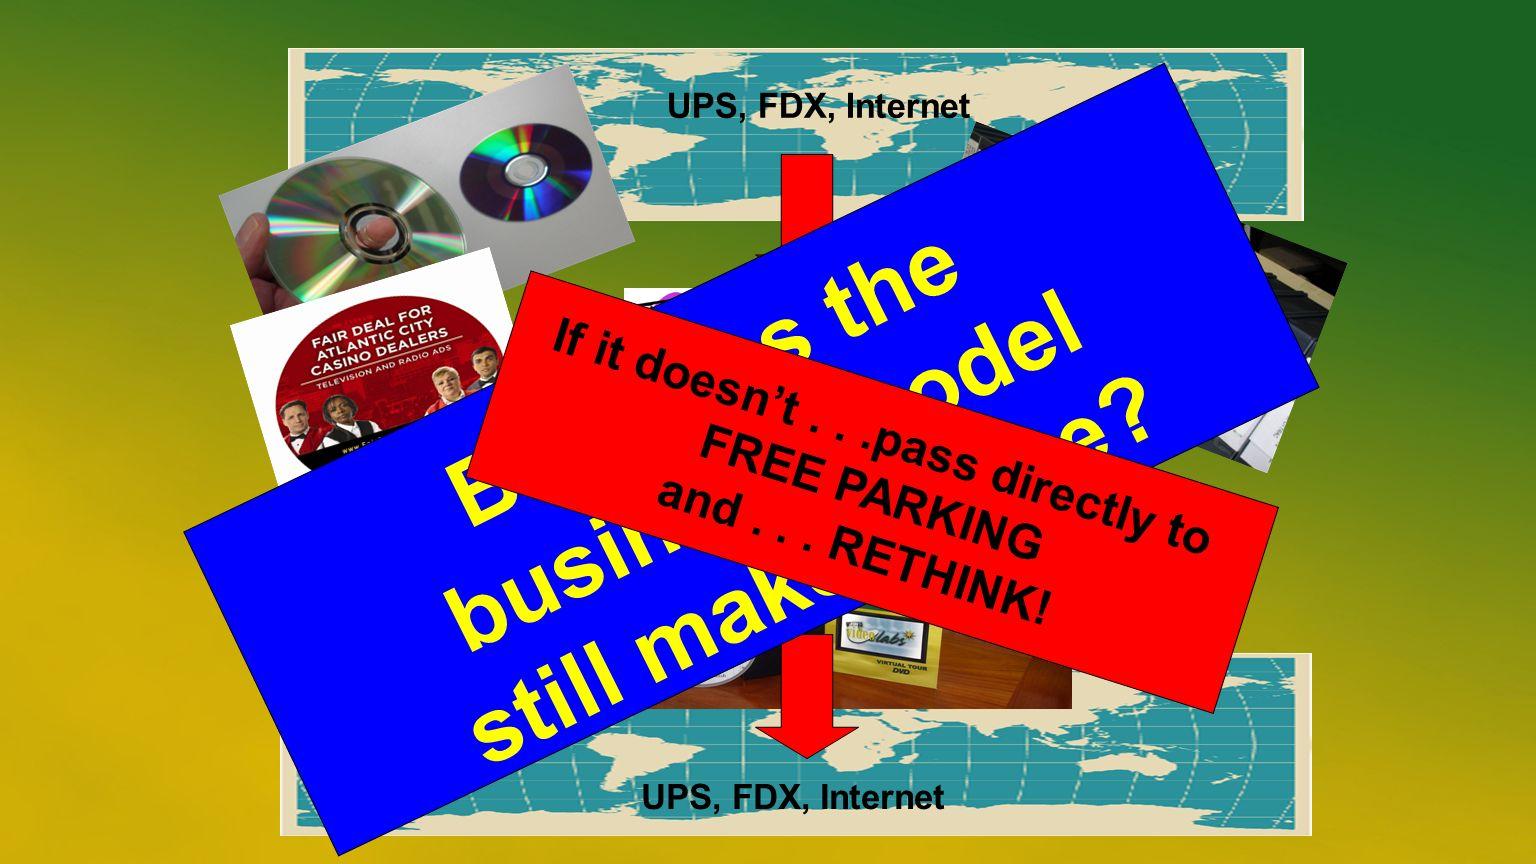 UPS, FDX, Internet But does the business model still make sense.